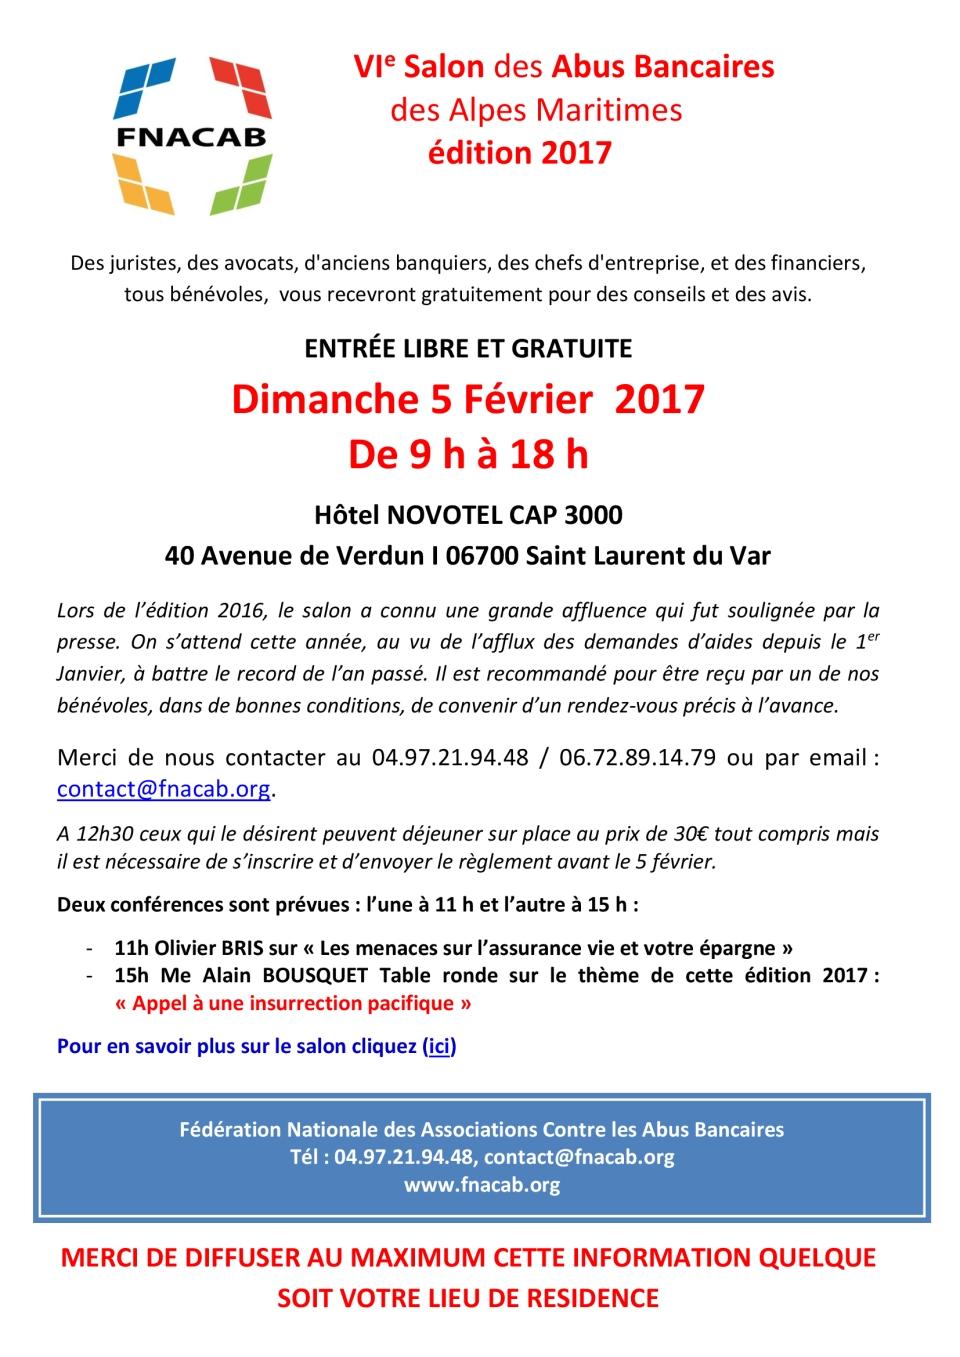 2017-vie-salon